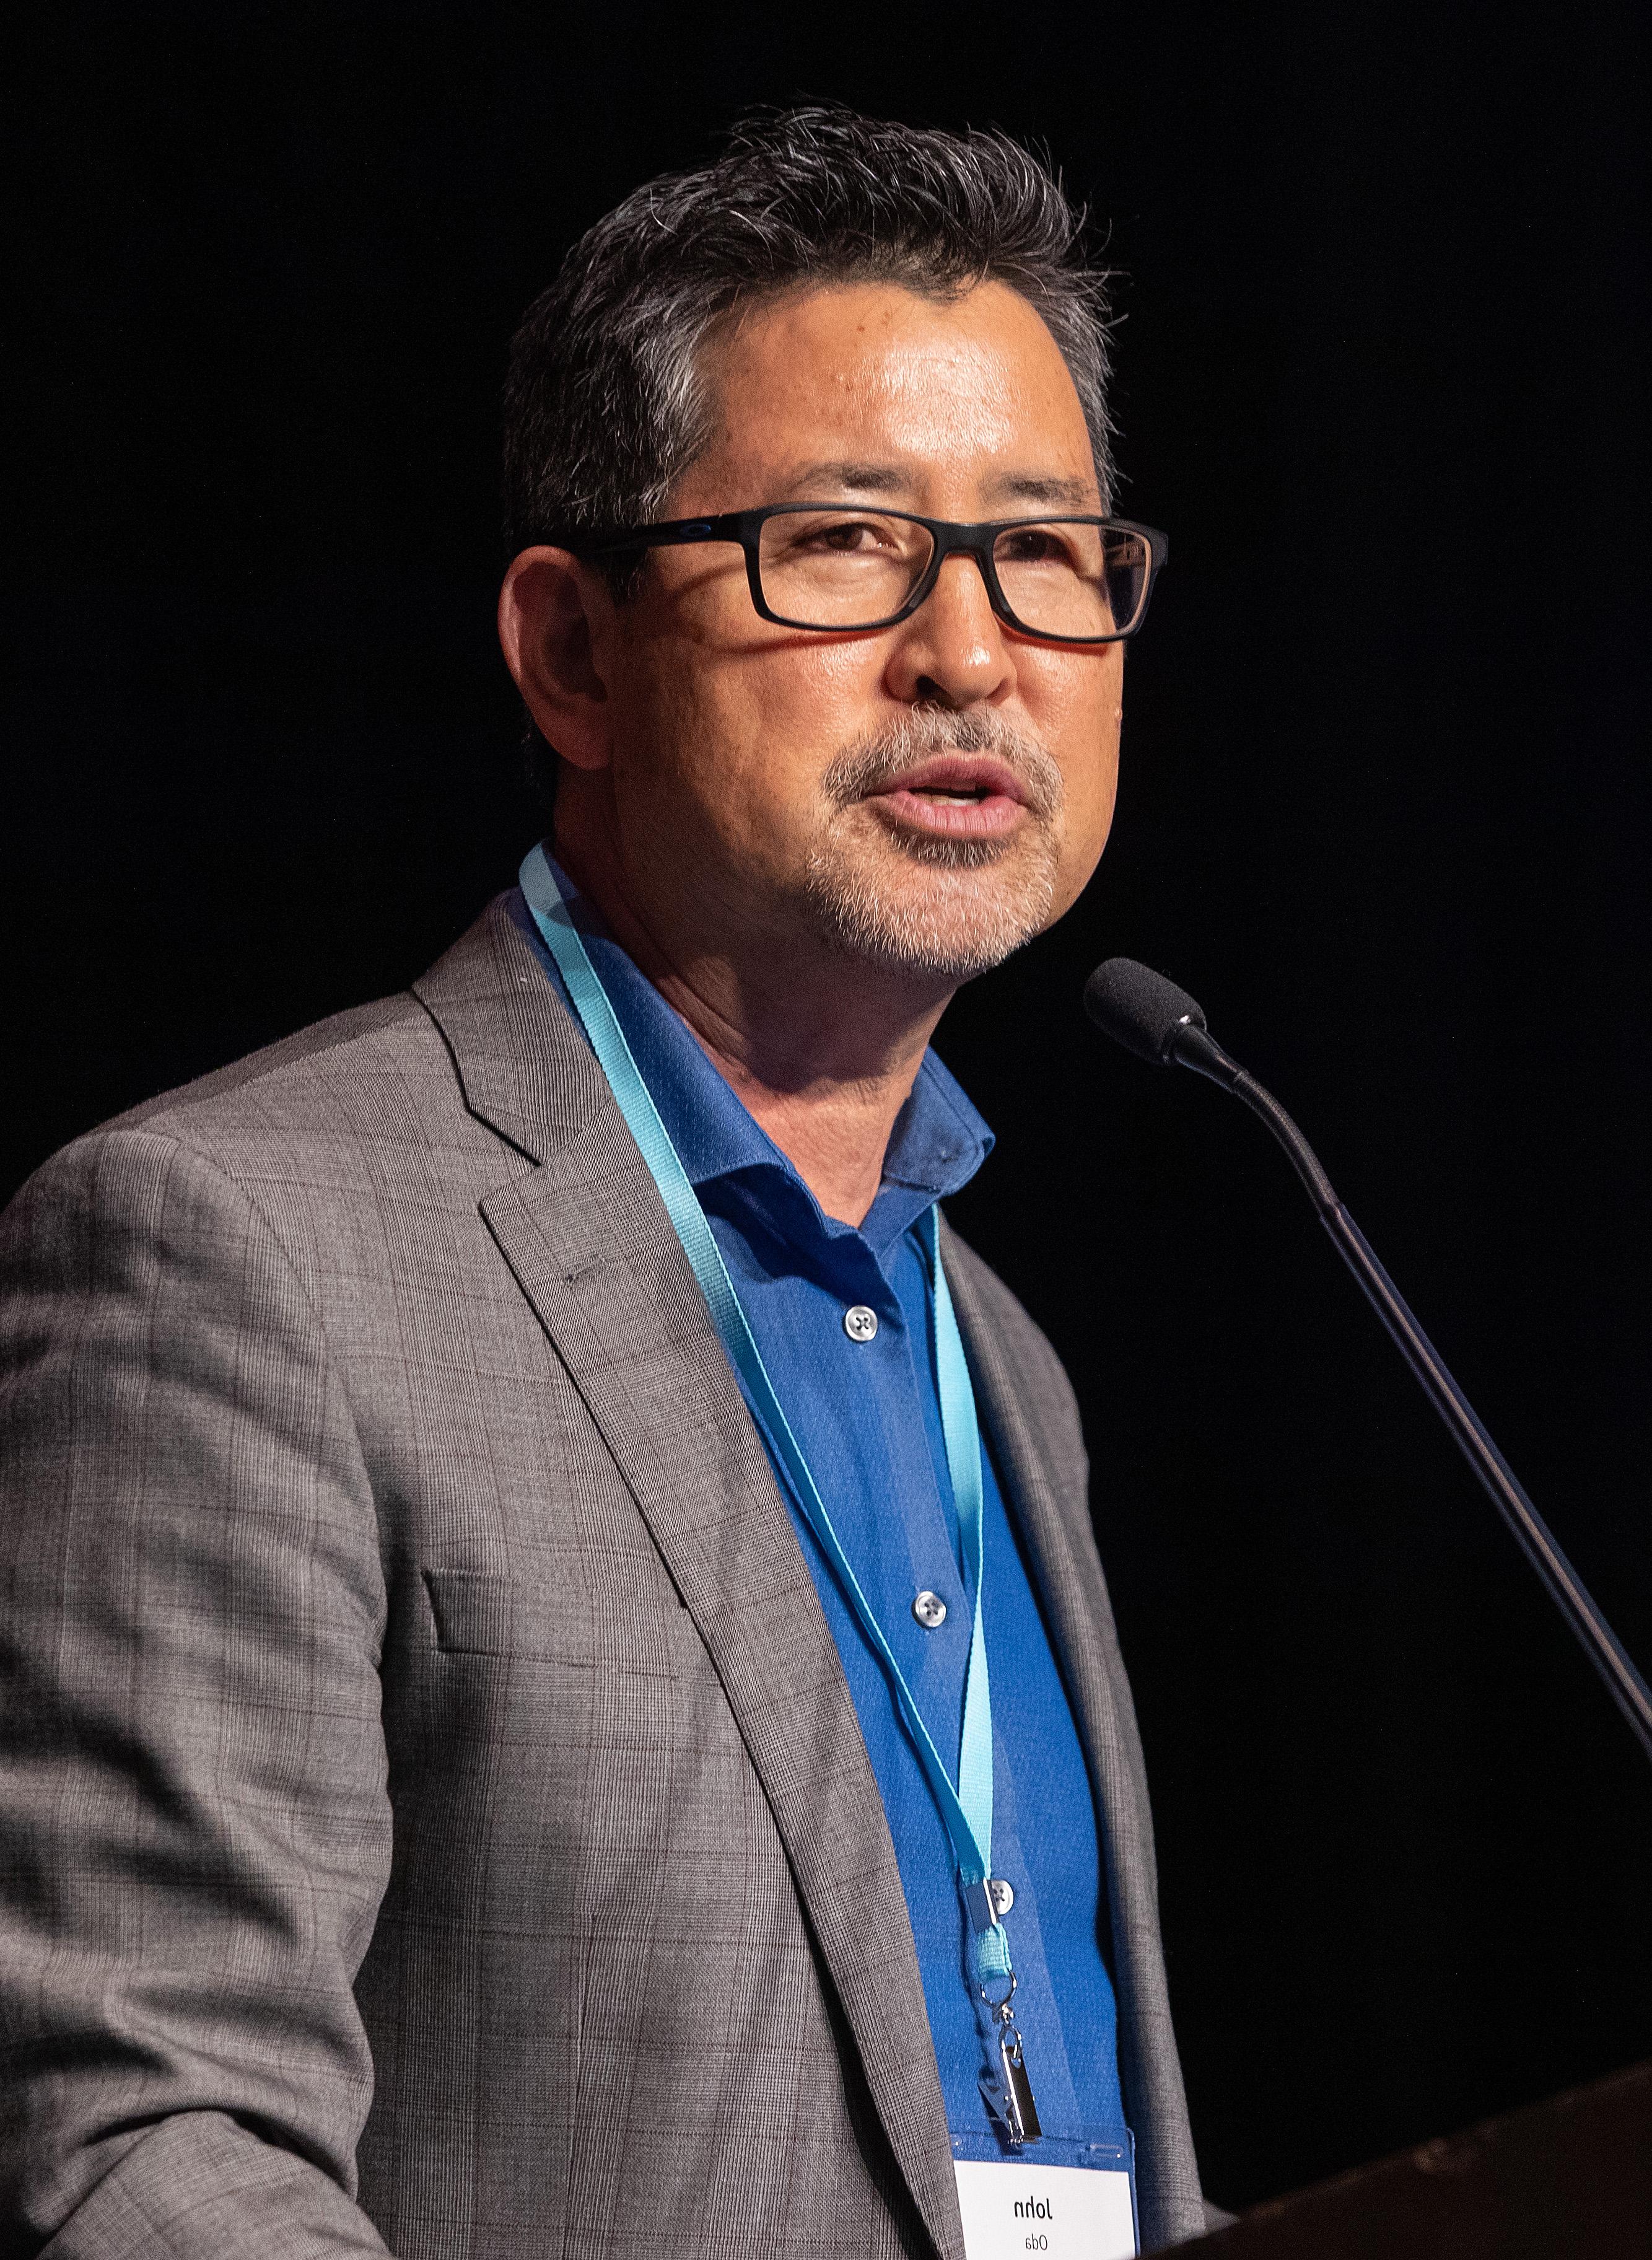 Rev. John Oda, Gerente del Plan para el Ministerio de Lengua Asiático-Americana. Foto Mike DuBose, Noticias MU.